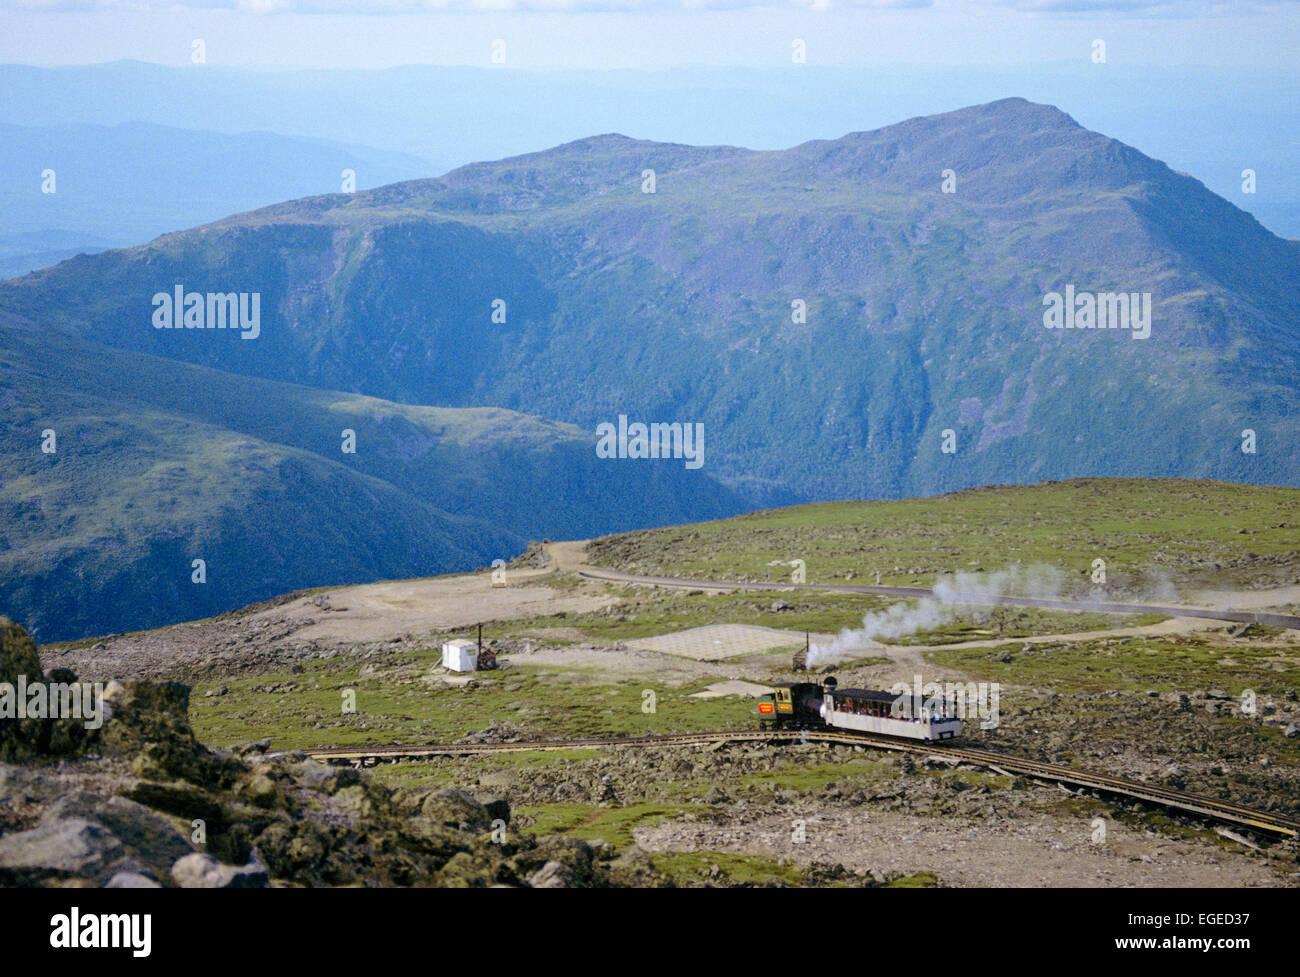 Cog train bringing passengers to the top of Mount Washington, New Hampshire, USA. - Stock Image